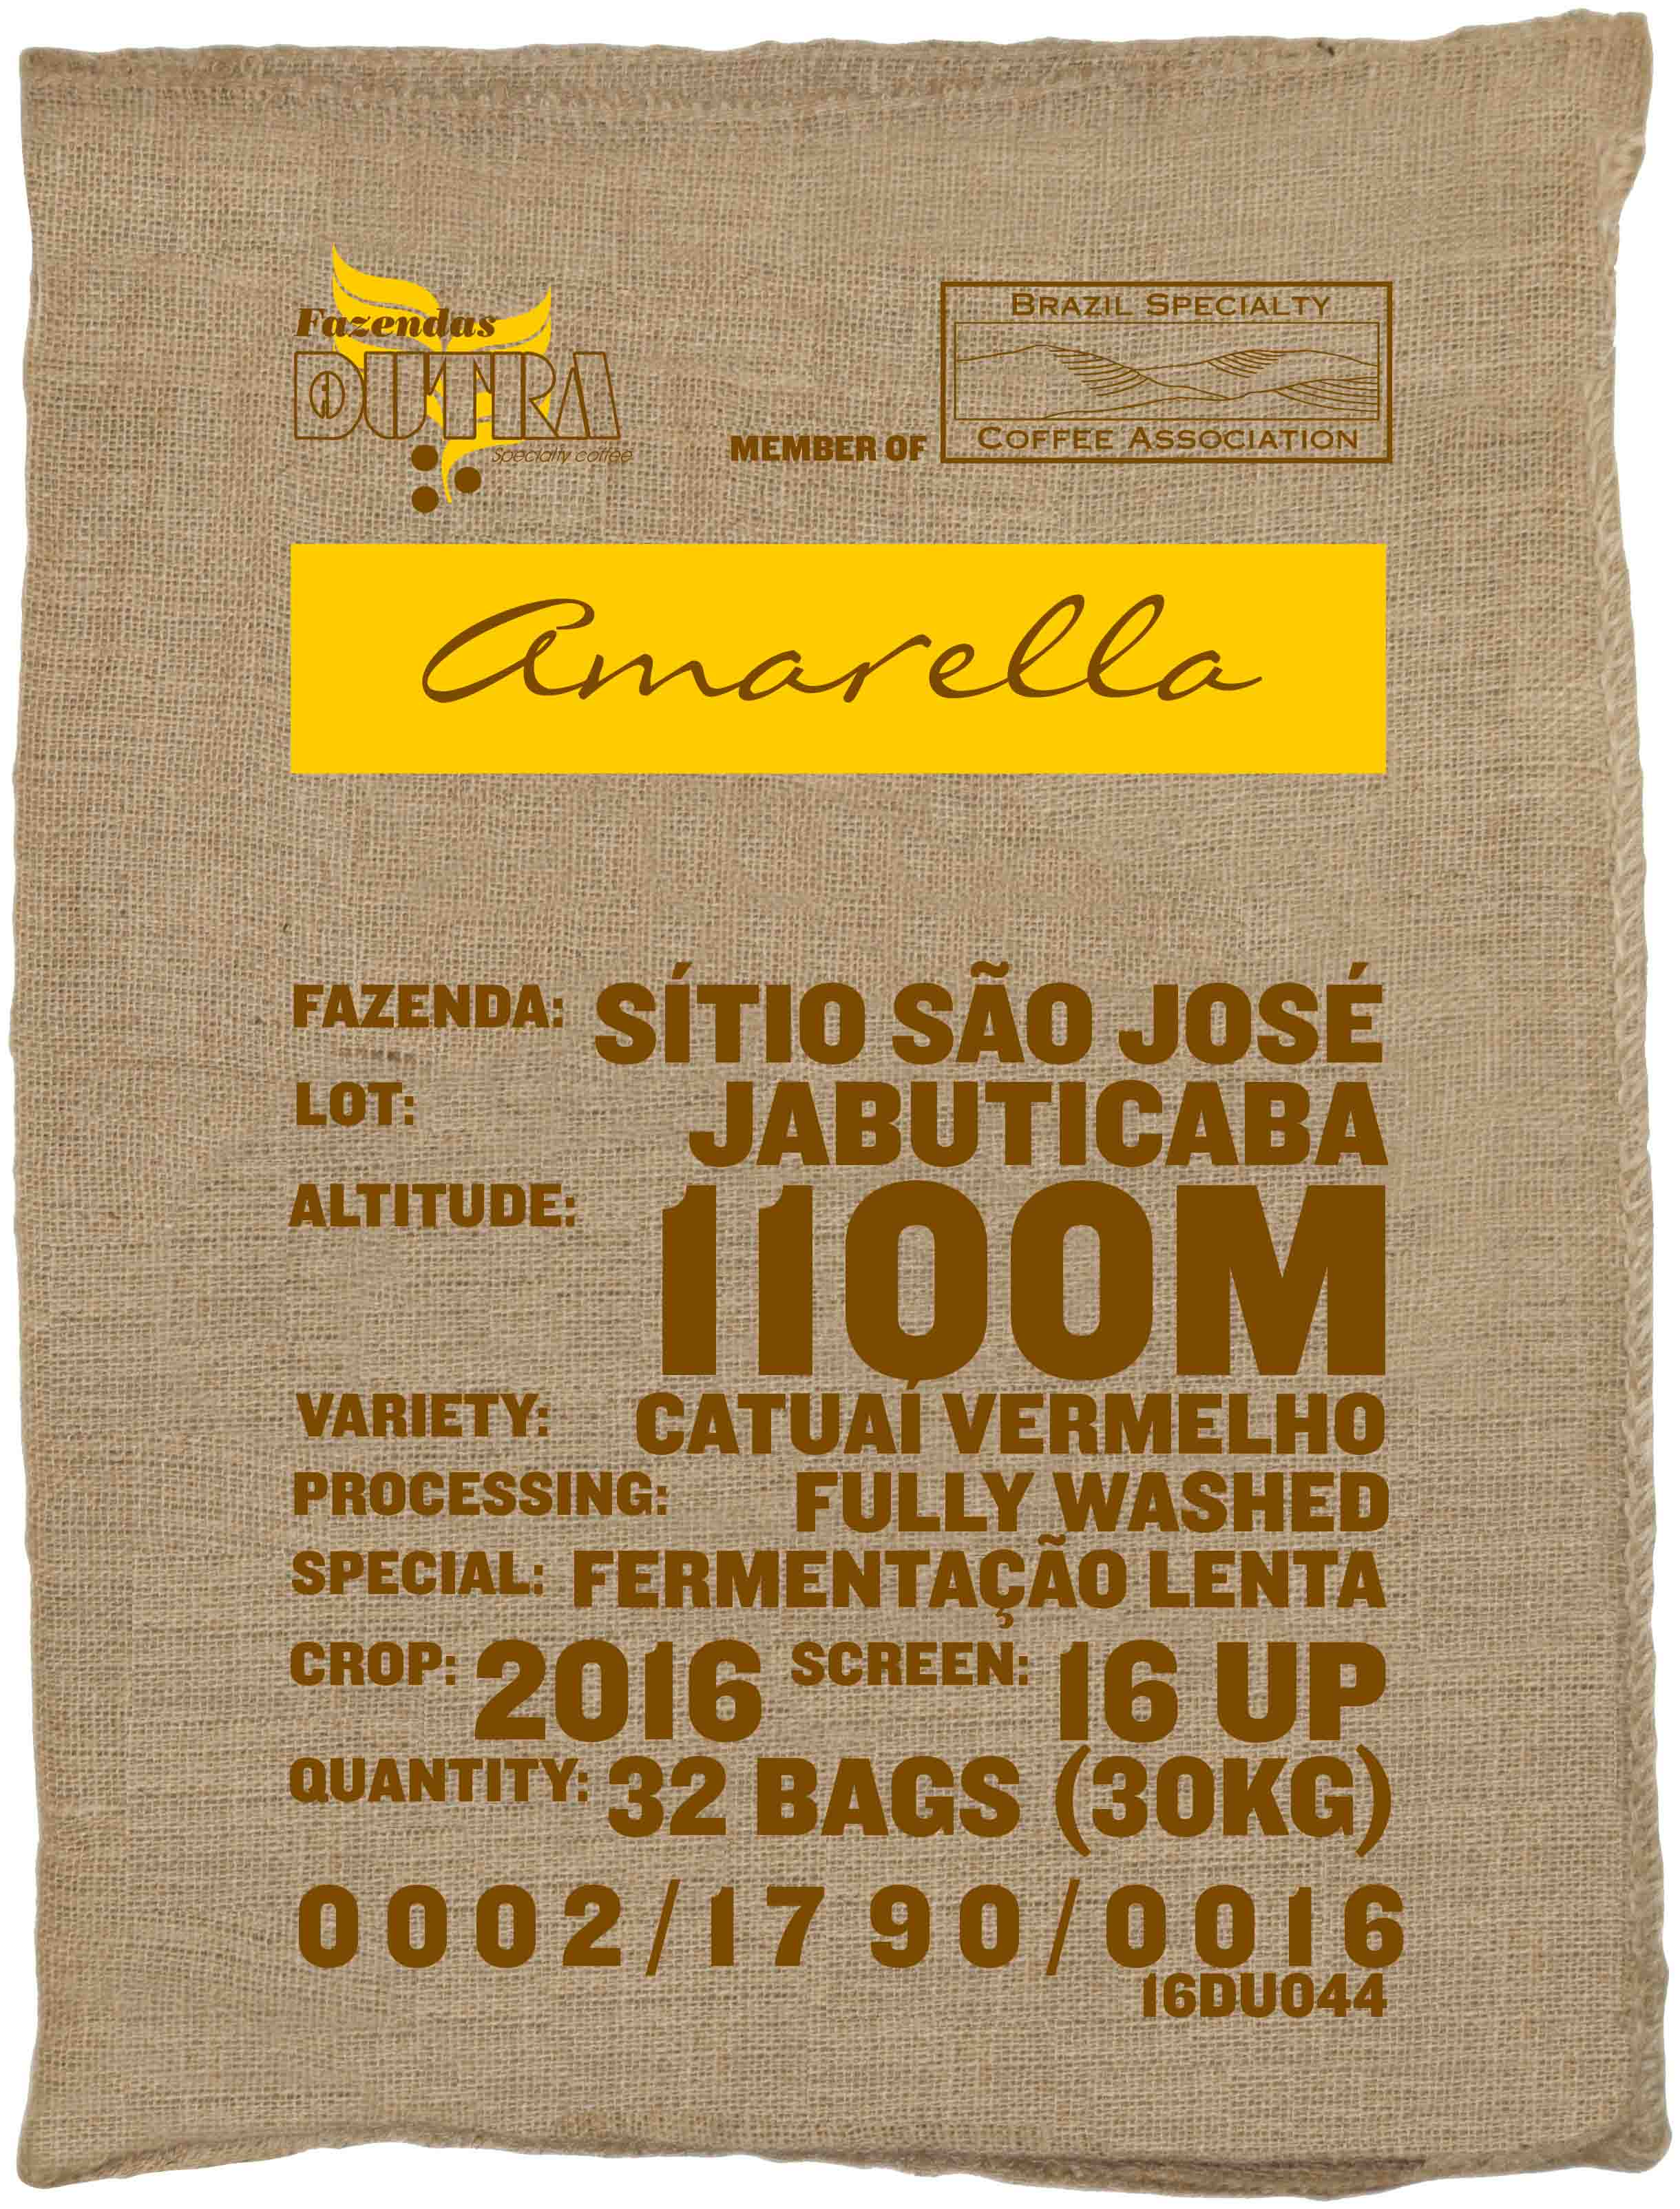 Ein Rohkaffeesack amarella Parzellenkaffe Varietät Catuai vermelho. Fazendas Dutra Lot Jabuticaba.